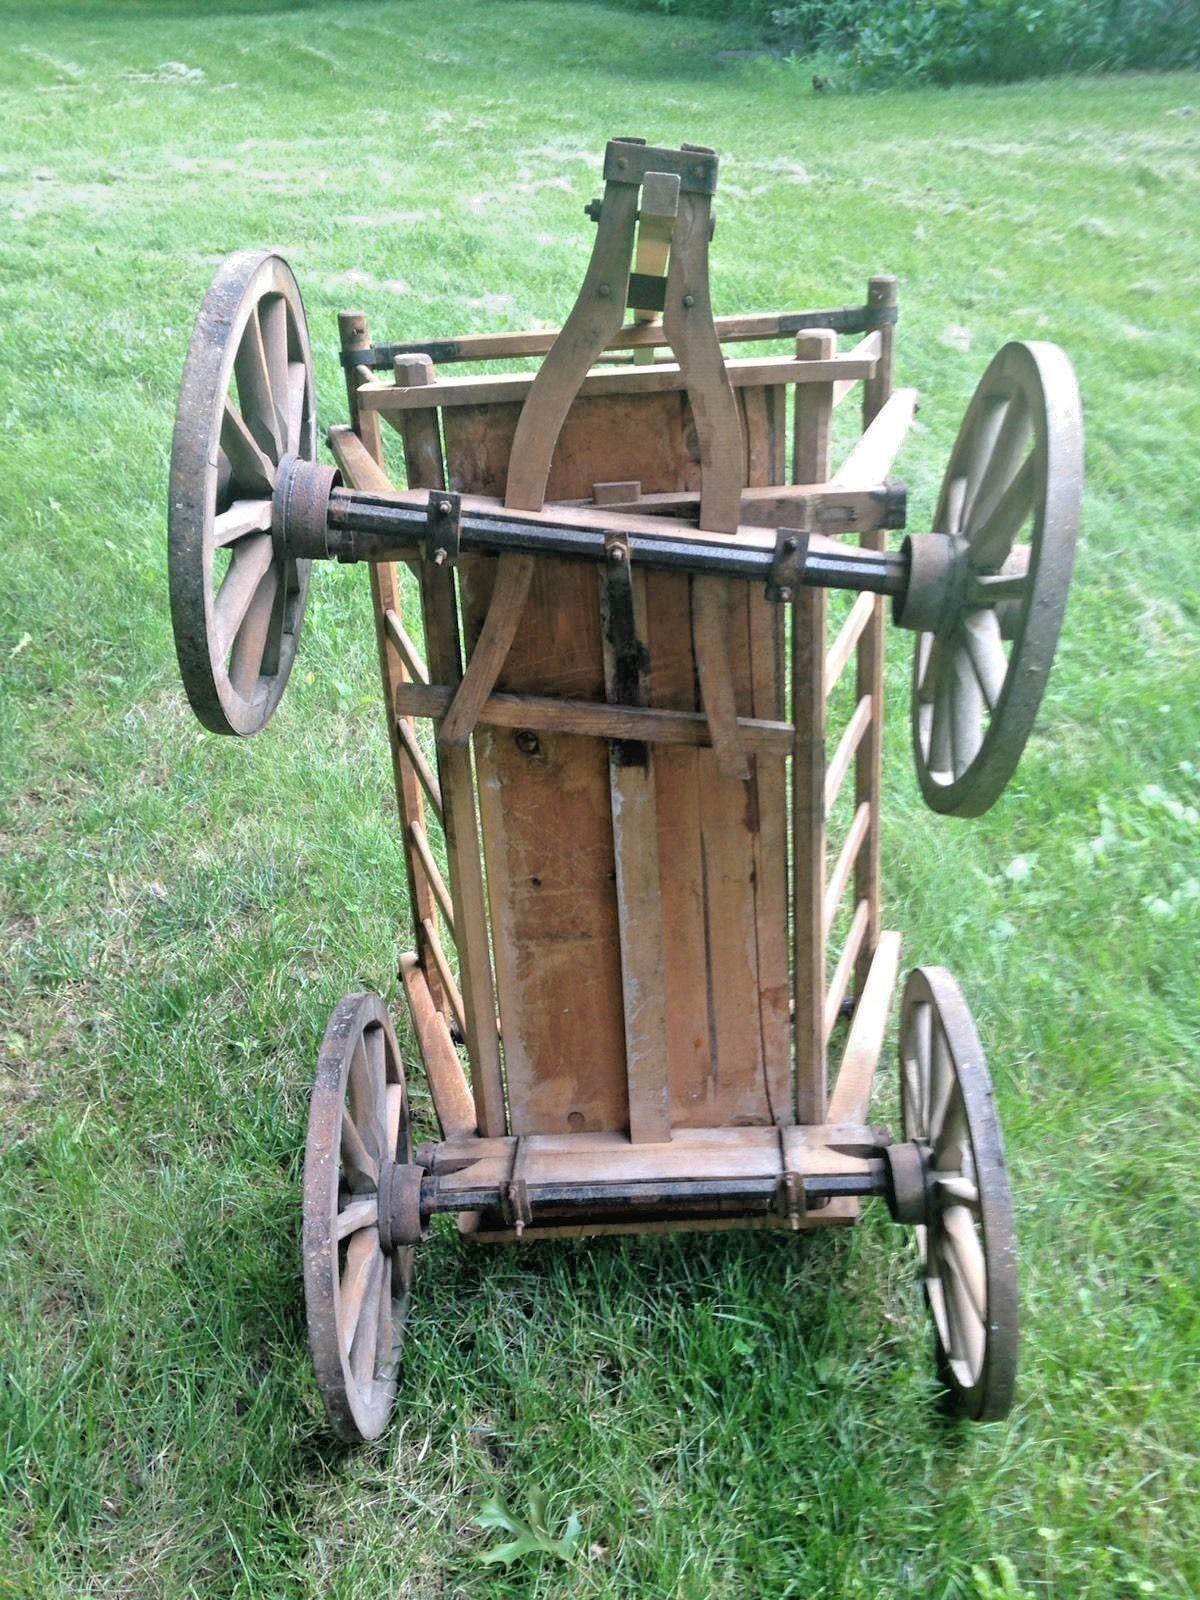 aydqxbdlaxkm garden lawn china rim steel product cart golf atv wheels wheel for